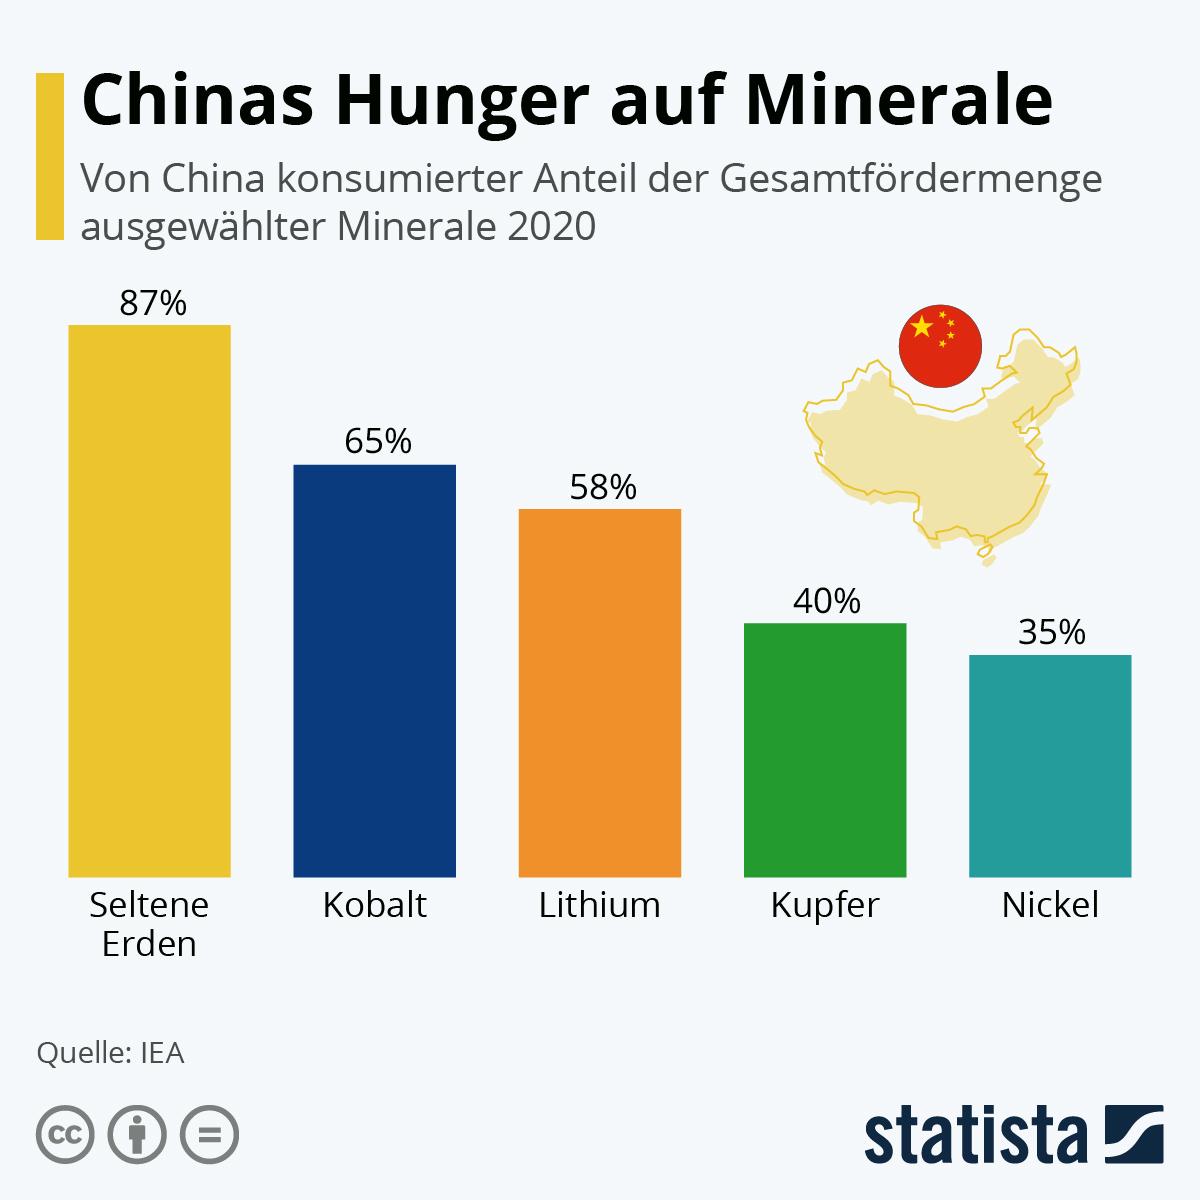 Infografik: Chinas Hunger auf Minerale | Statista